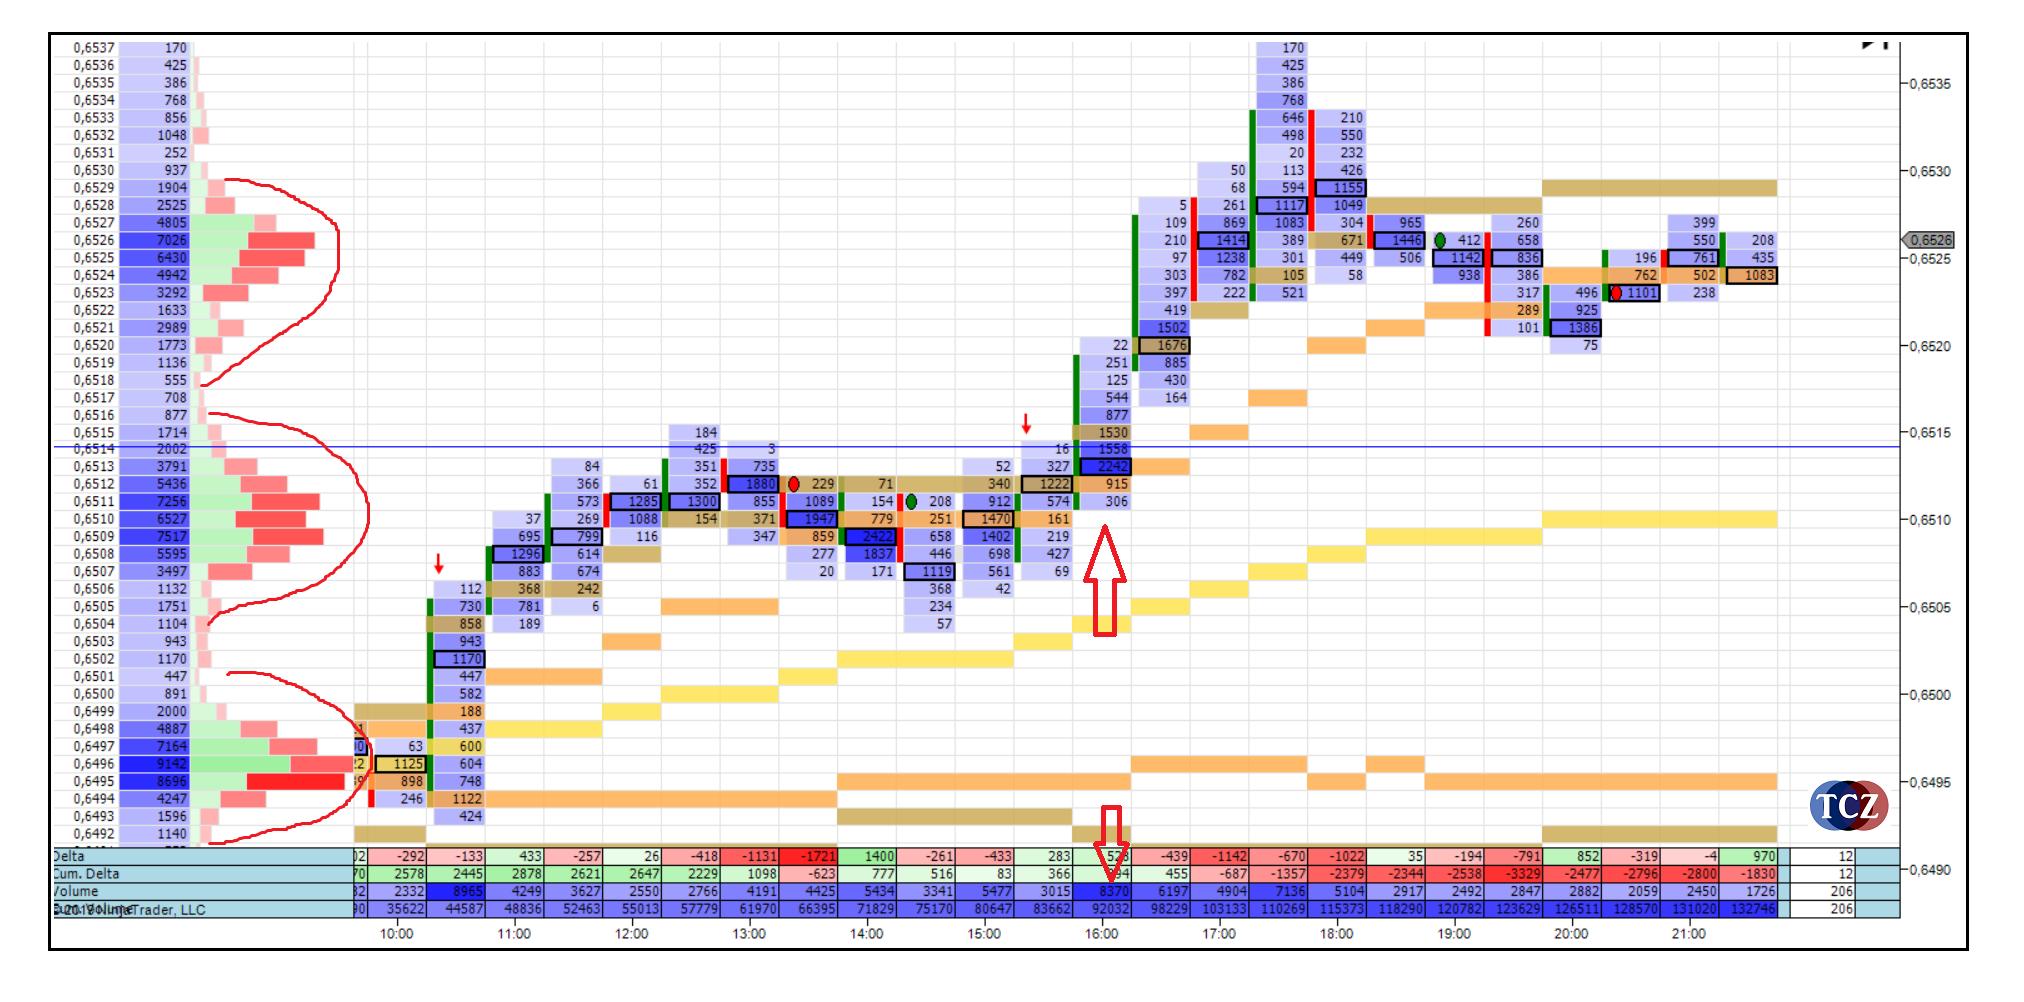 Hloubka trhu volume na burze